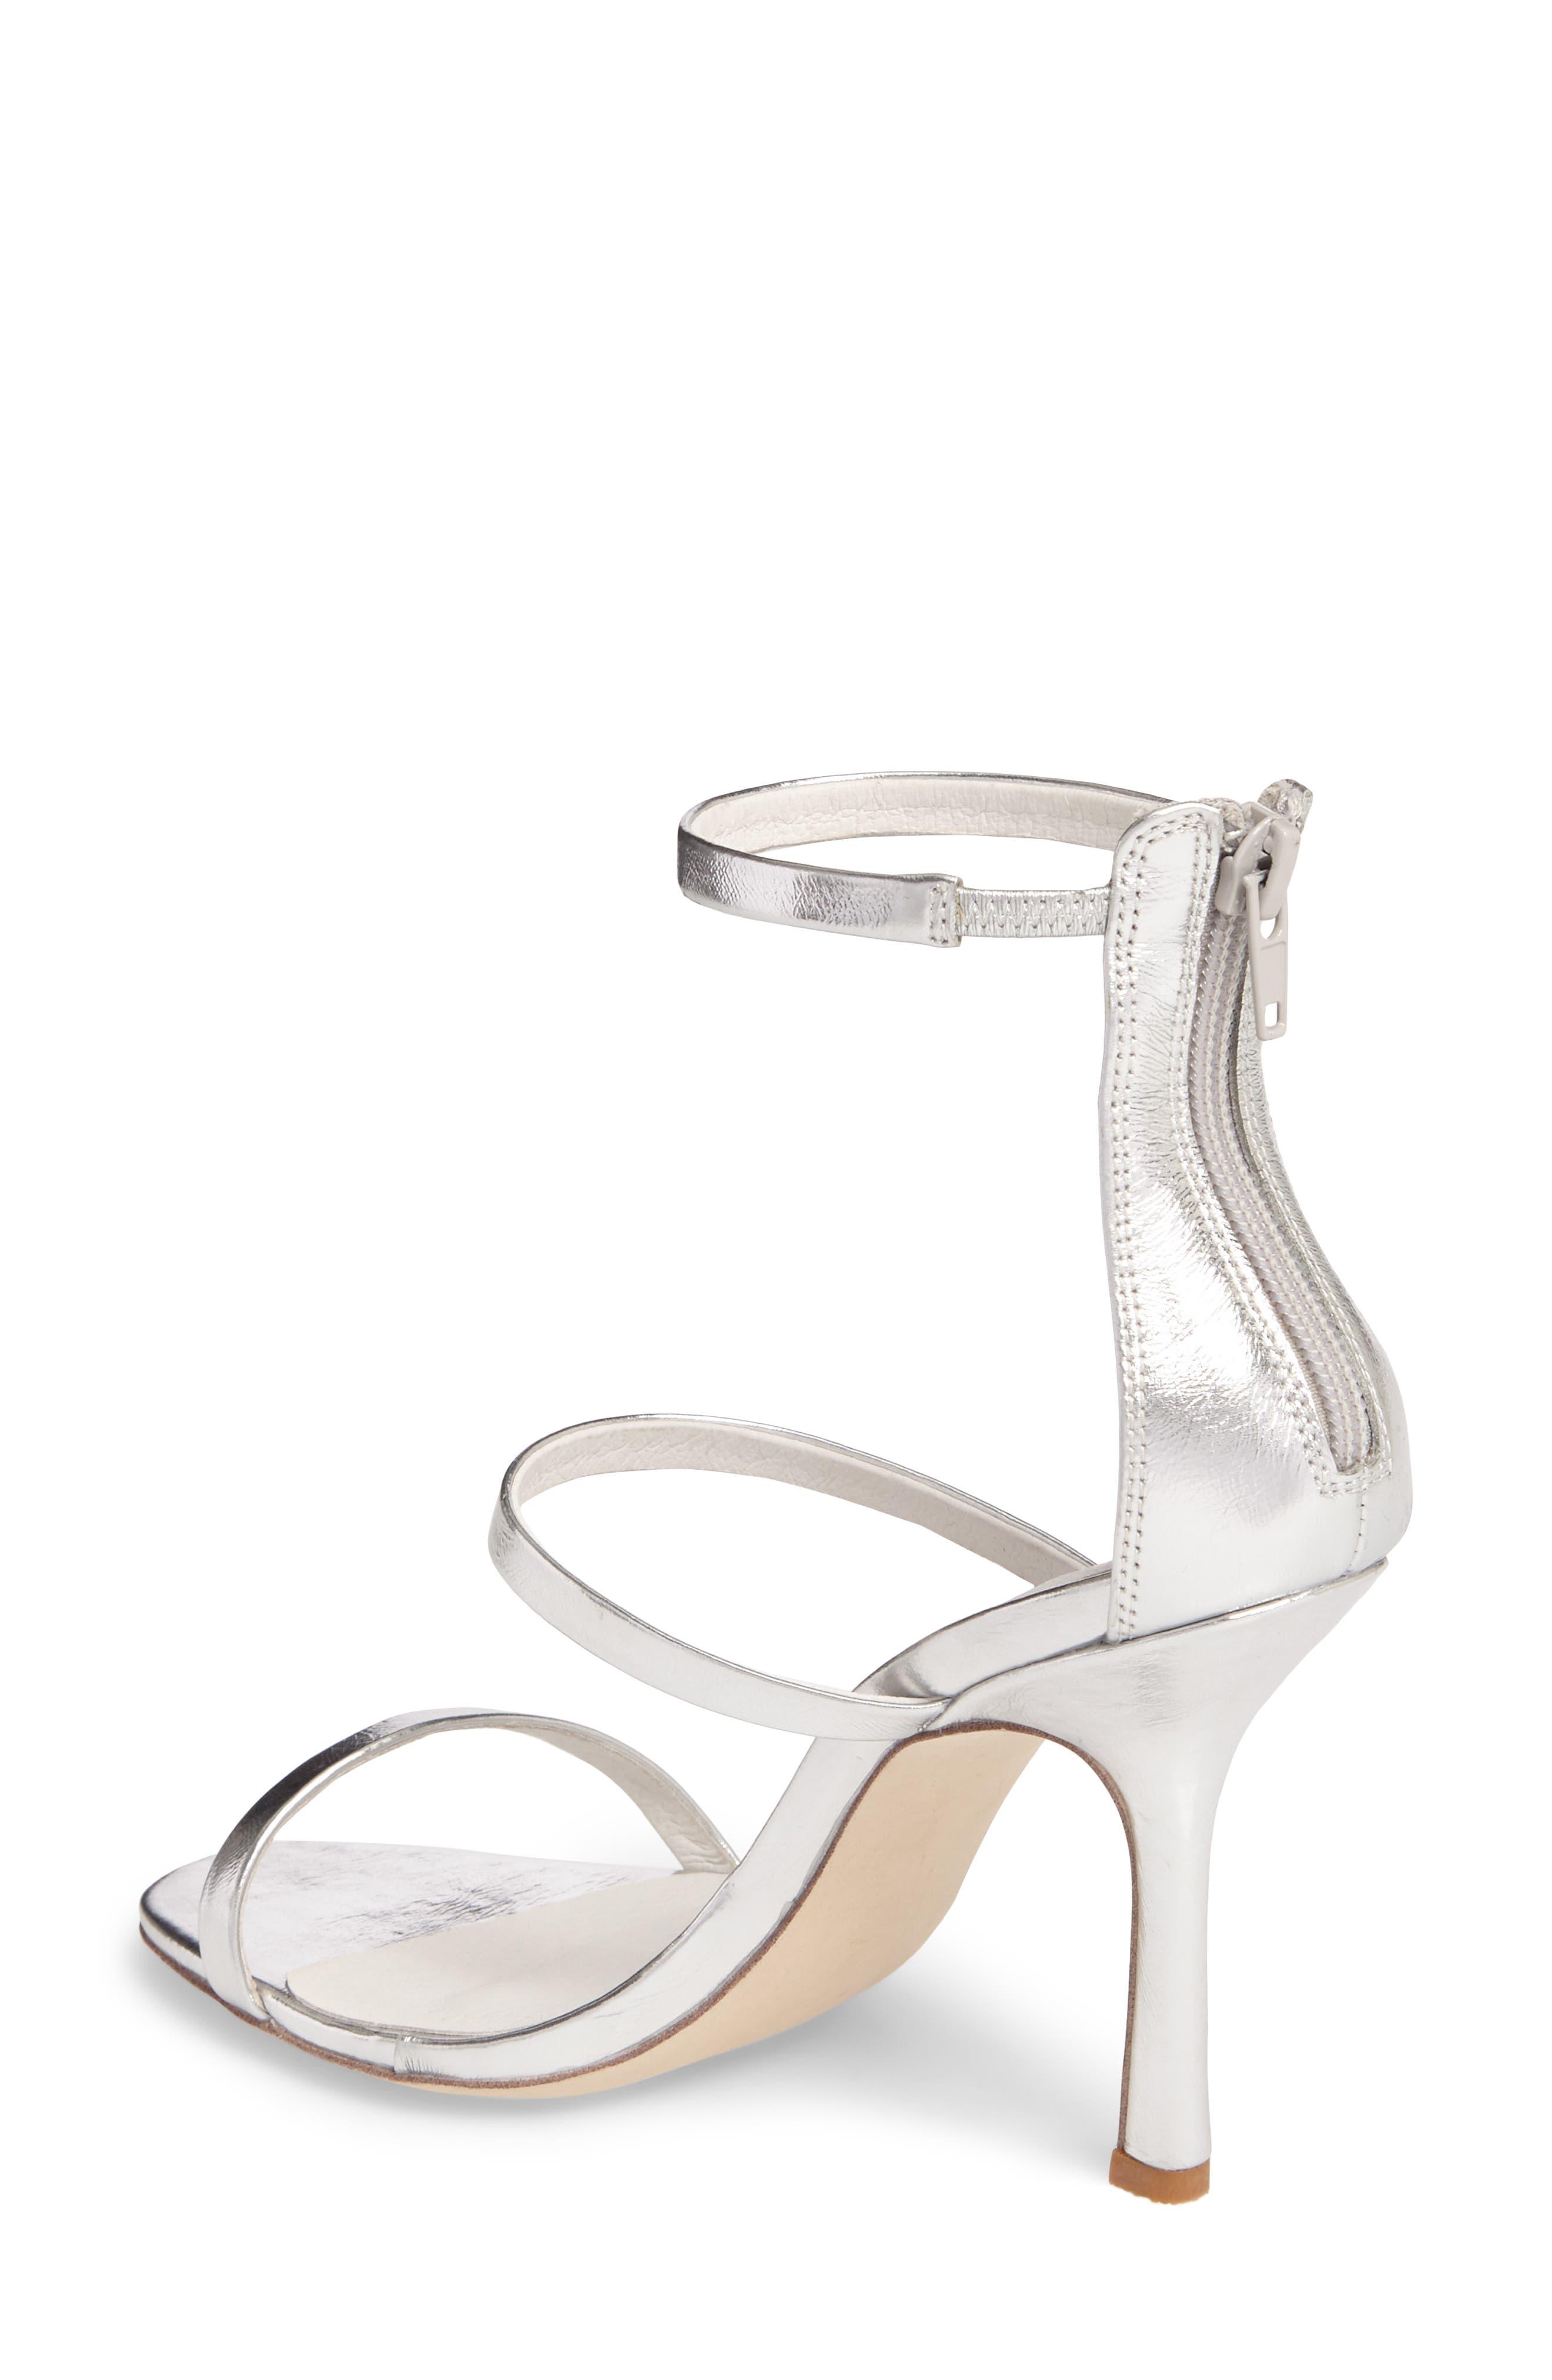 Kassia Ankle Strap Sandal,                             Alternate thumbnail 4, color,